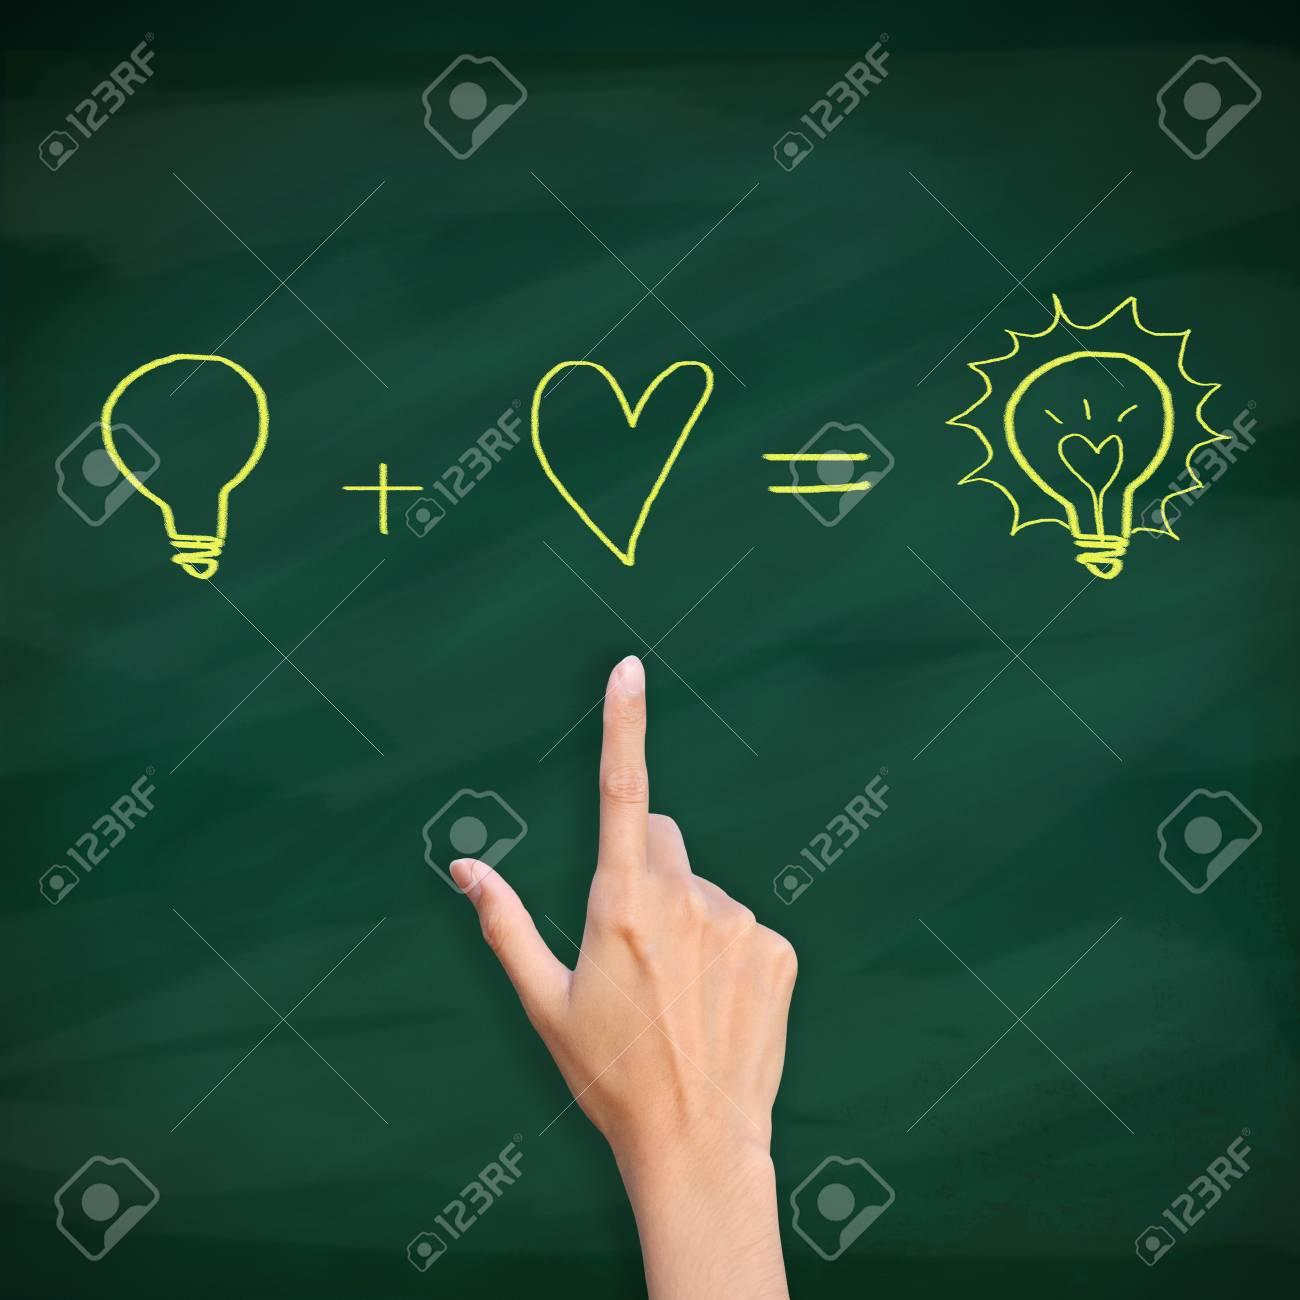 finger point to light bulb drawn on blackboard Stock Photo - 12854712